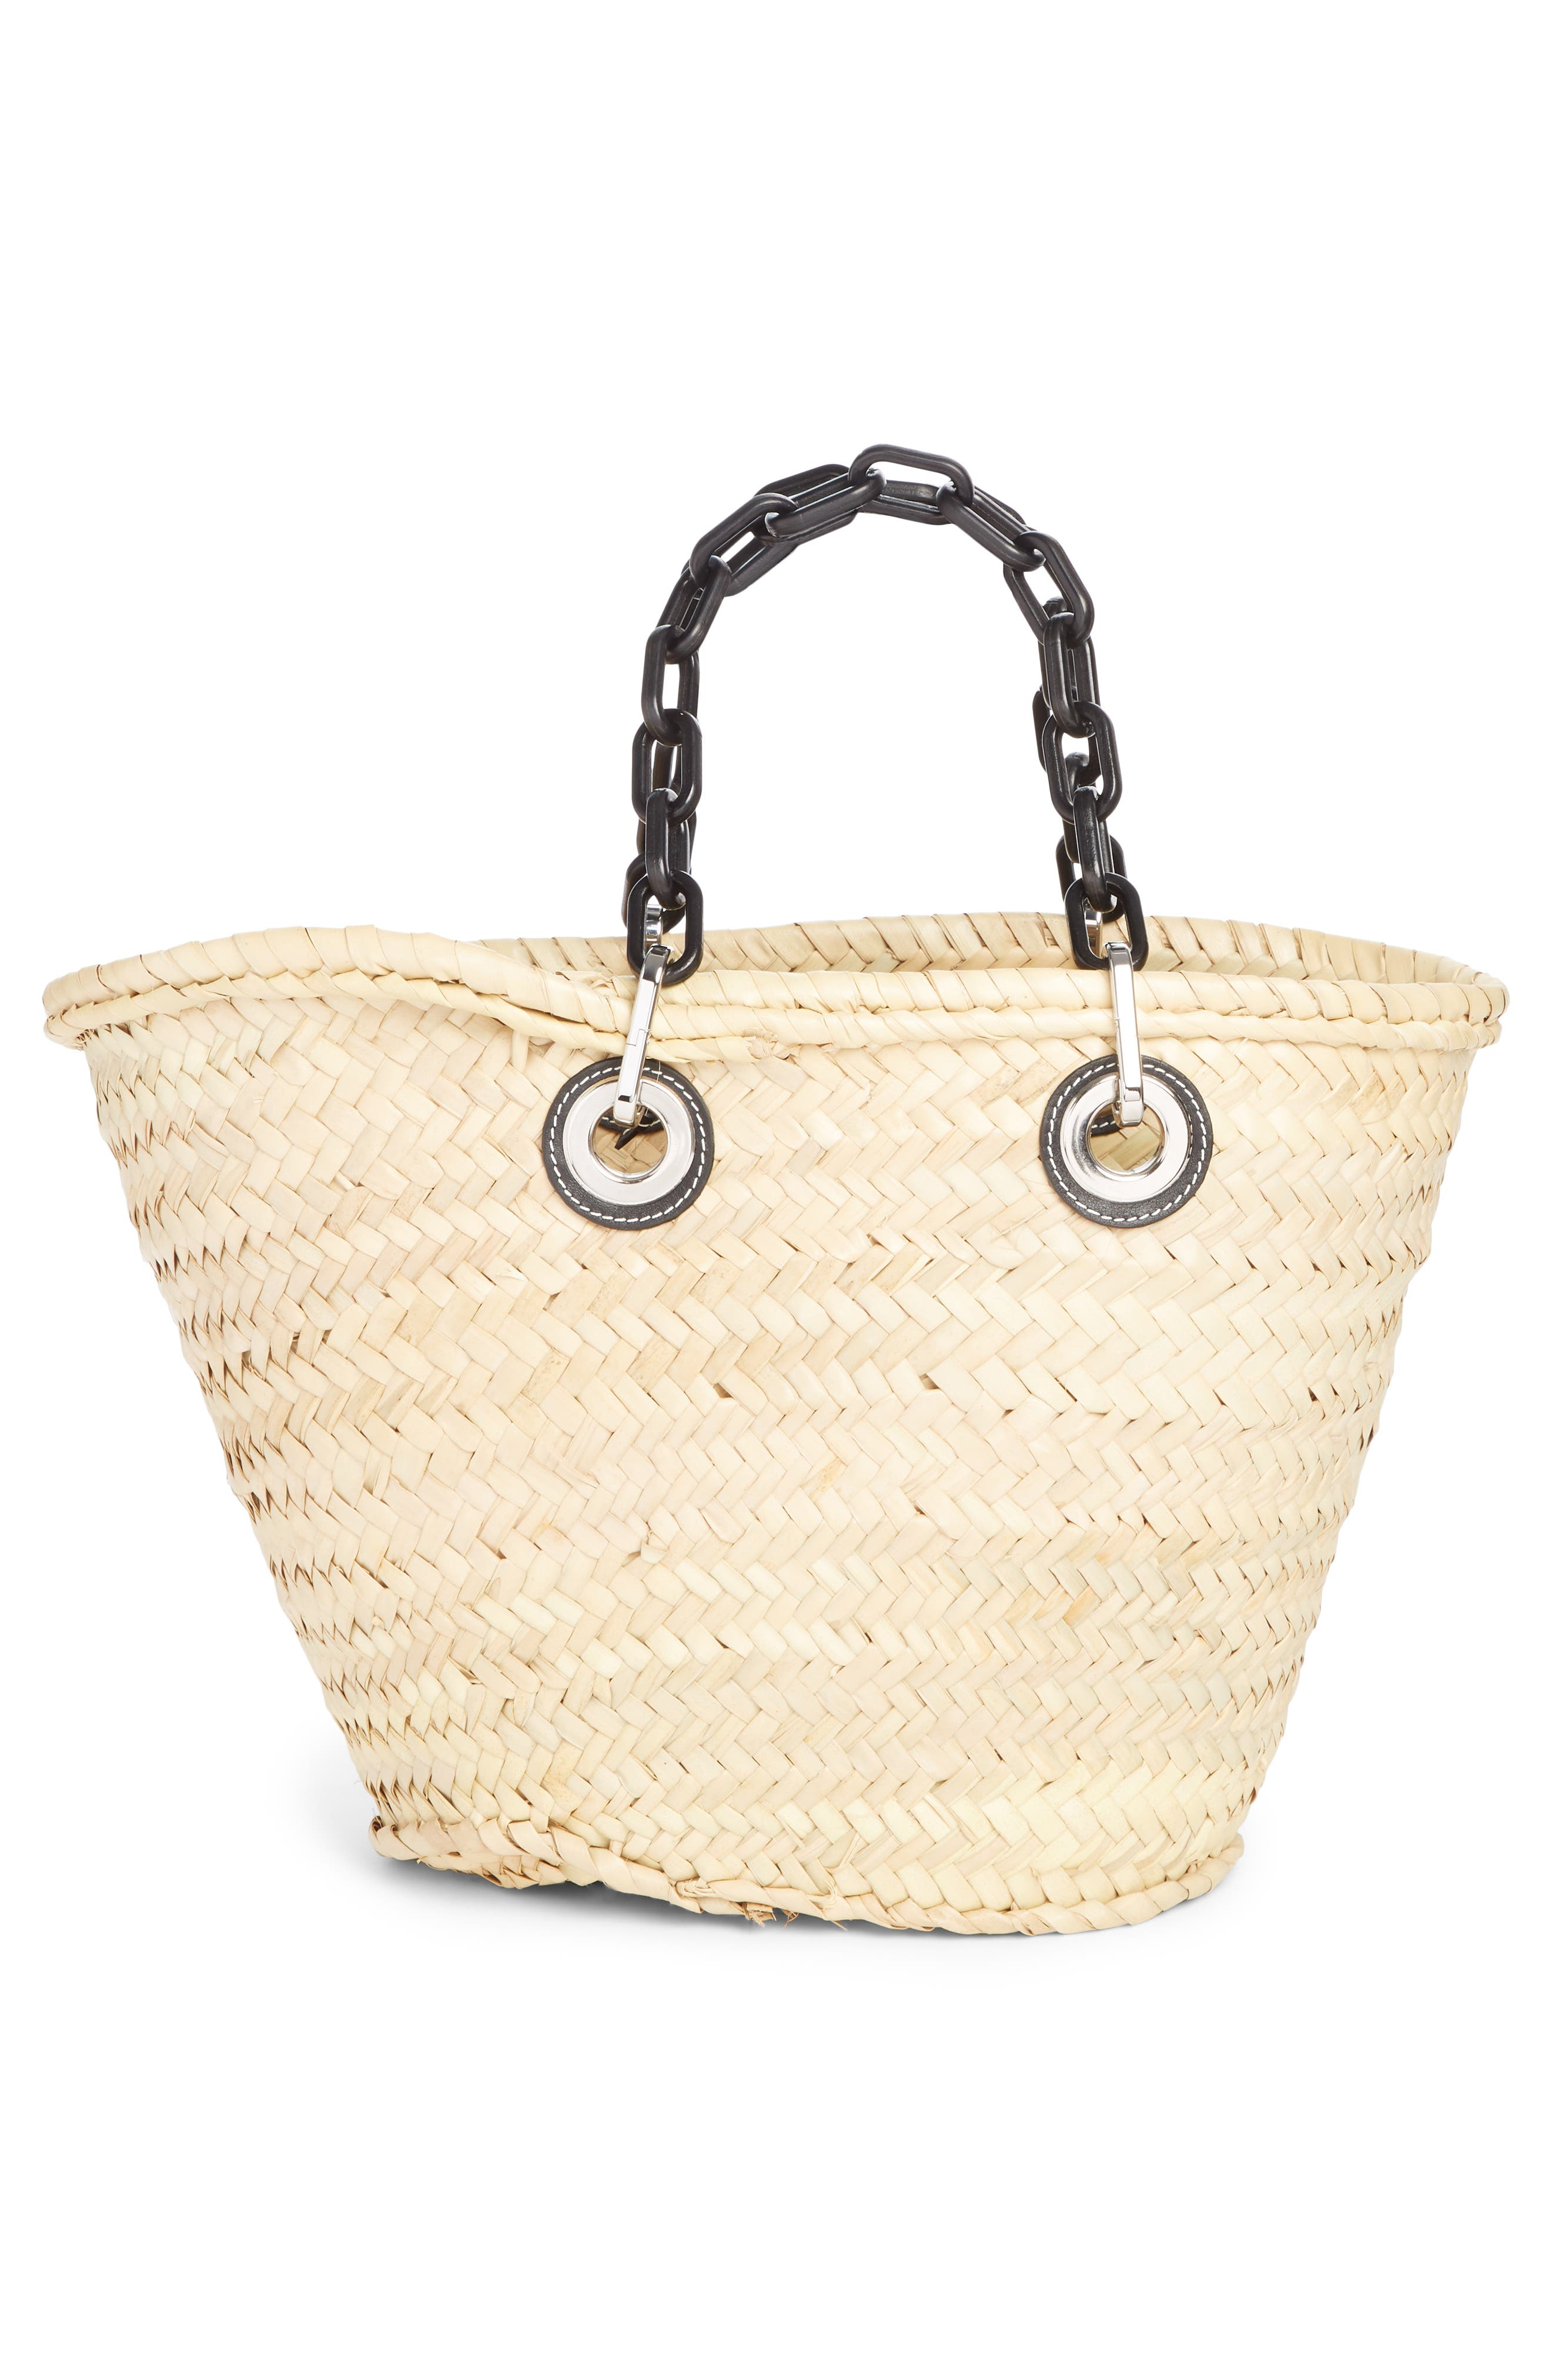 LOEWE, Chain Handle Woven Palm Market Basket, Alternate thumbnail 3, color, NATURAL/ BLACK